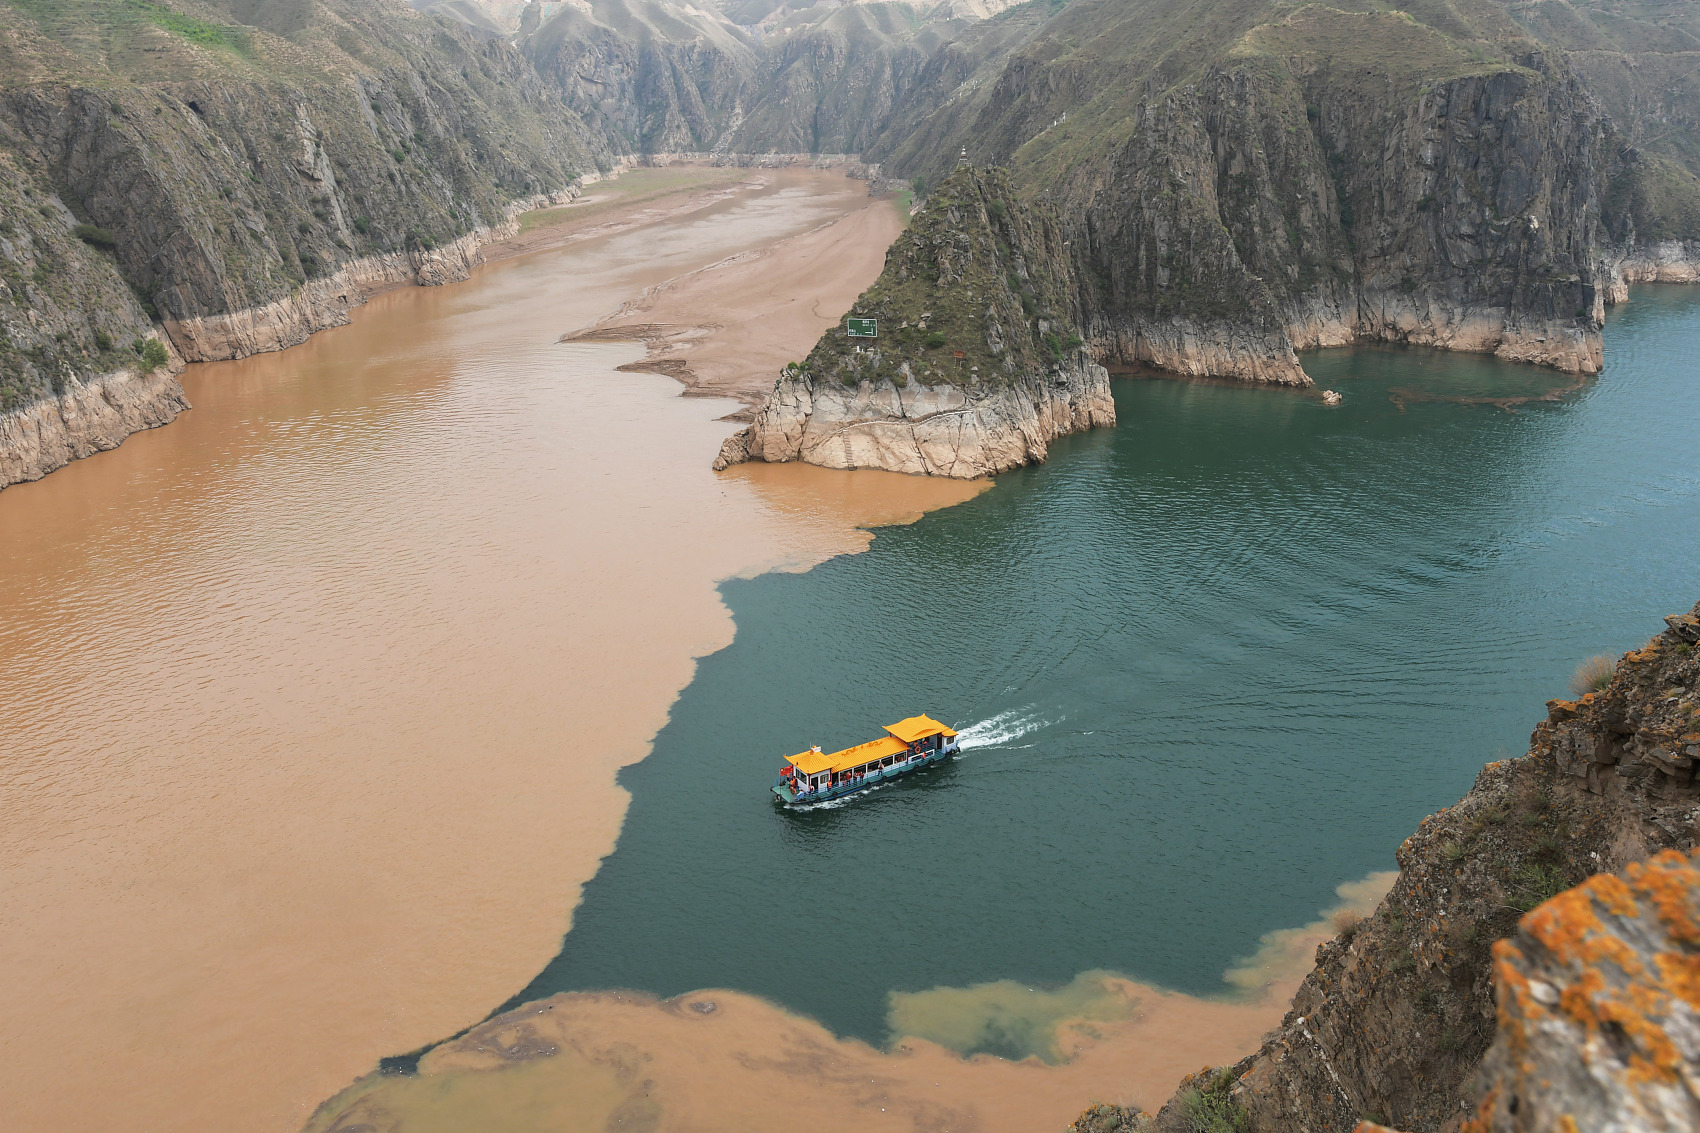 An aerial view of Liujiaxia Reservoir in Northwest China's Gansu Province